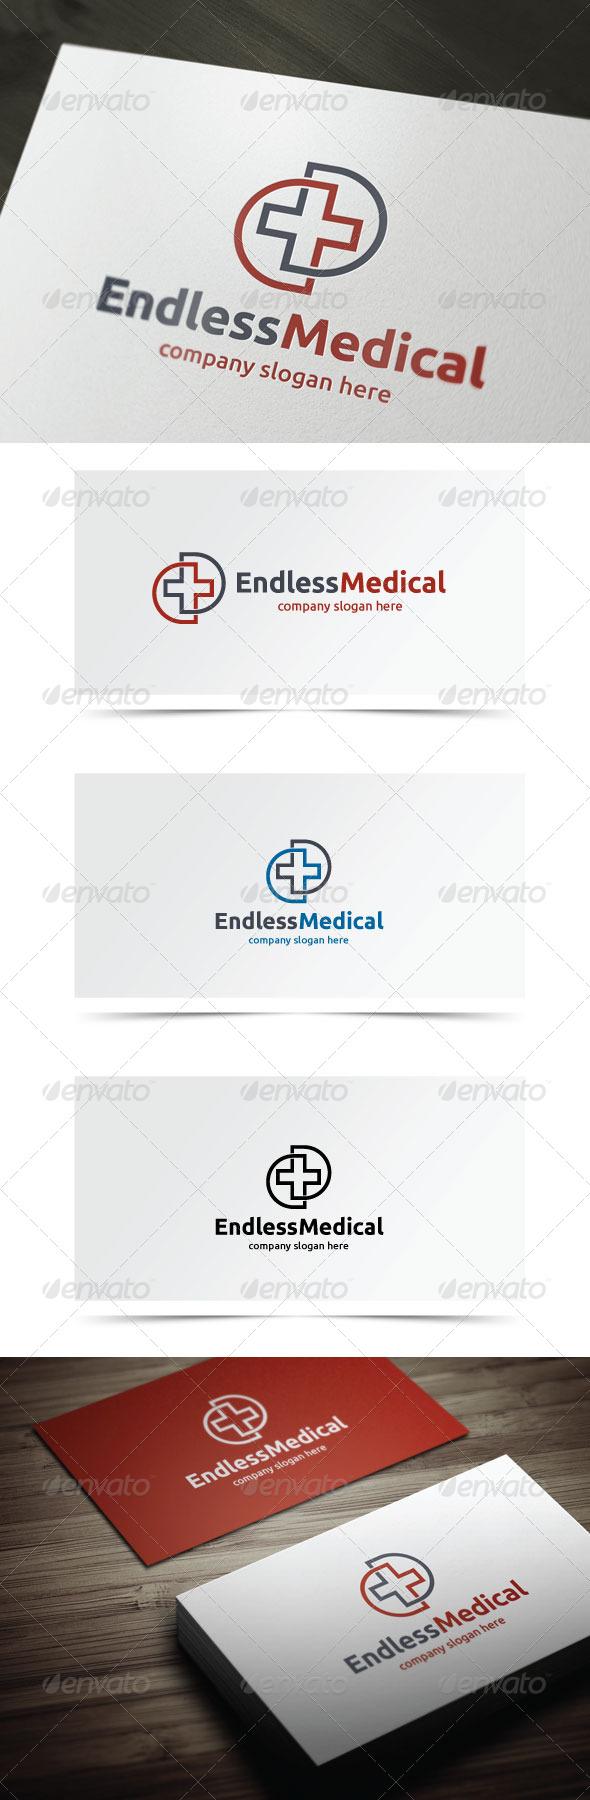 Endless Medical - Symbols Logo Templates